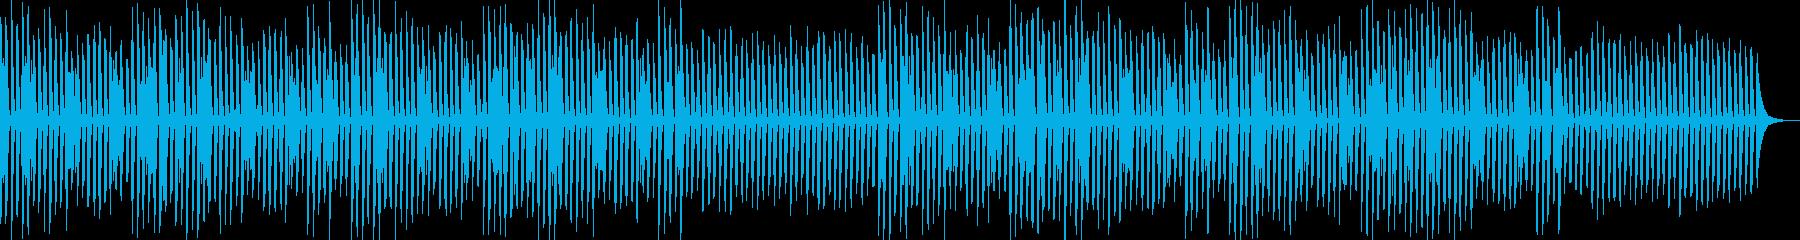 YouTube・軽快・楽しい・ピアノソロの再生済みの波形